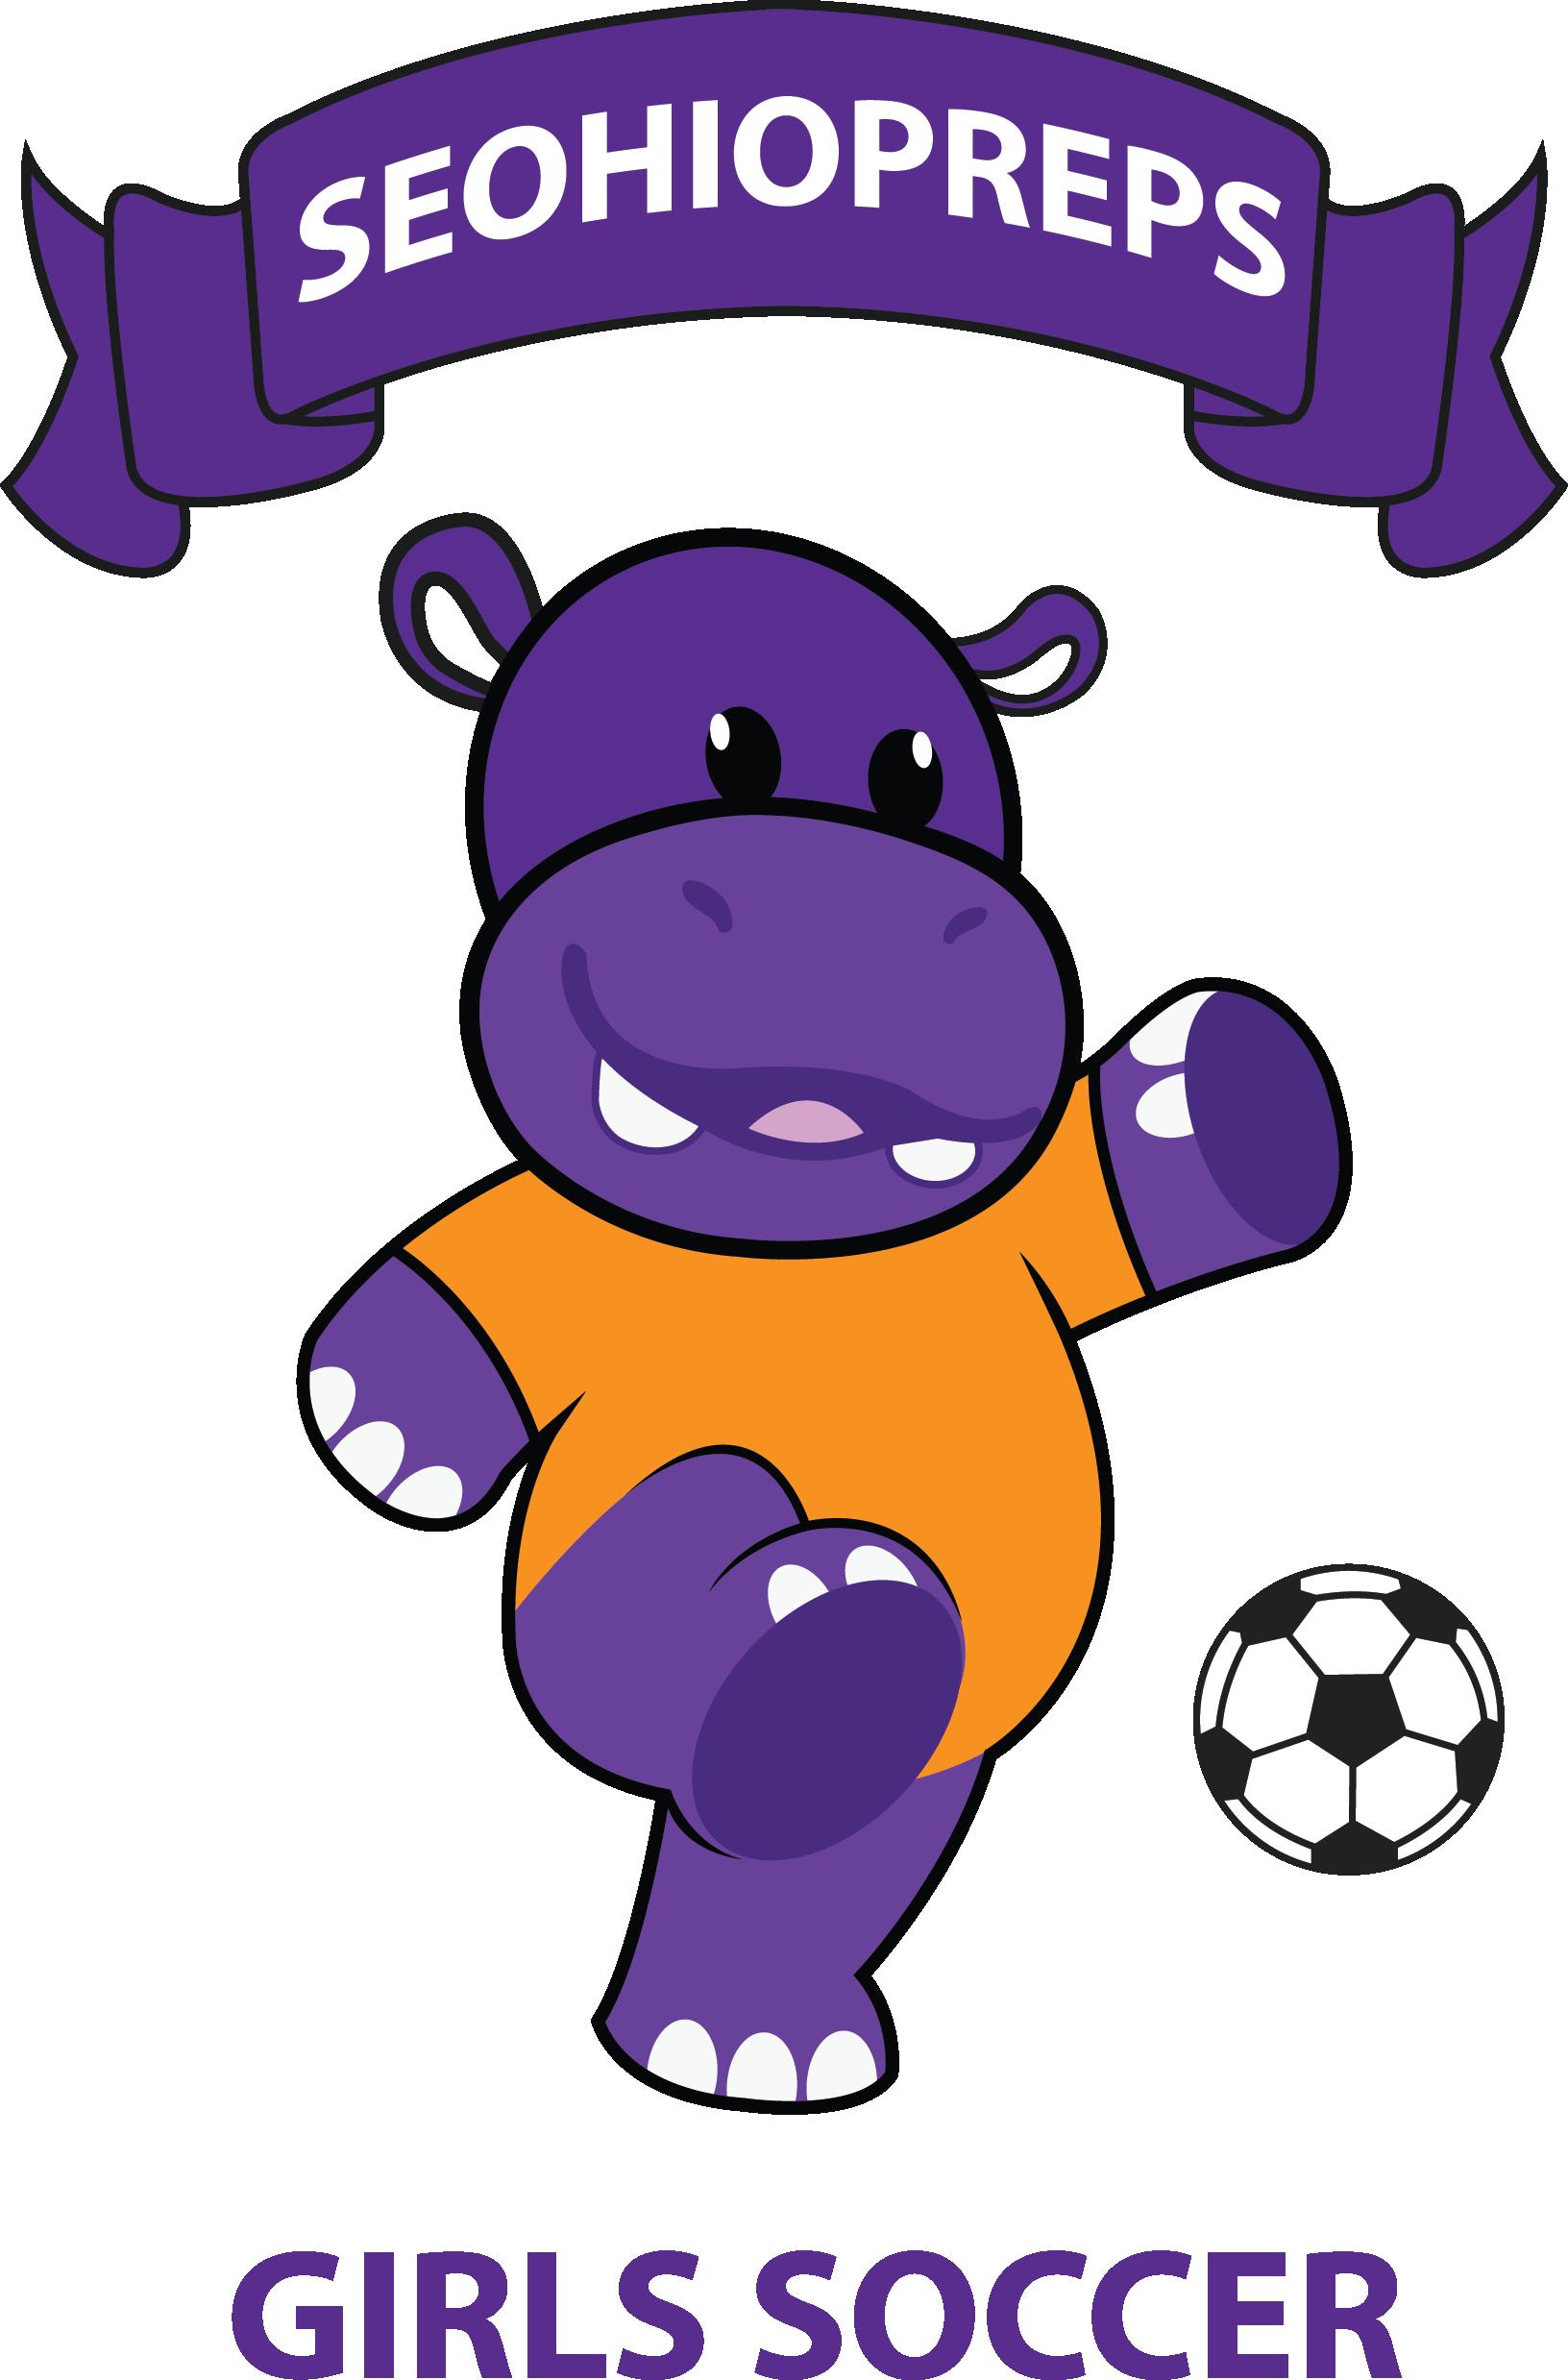 seohiopreps girls soccer